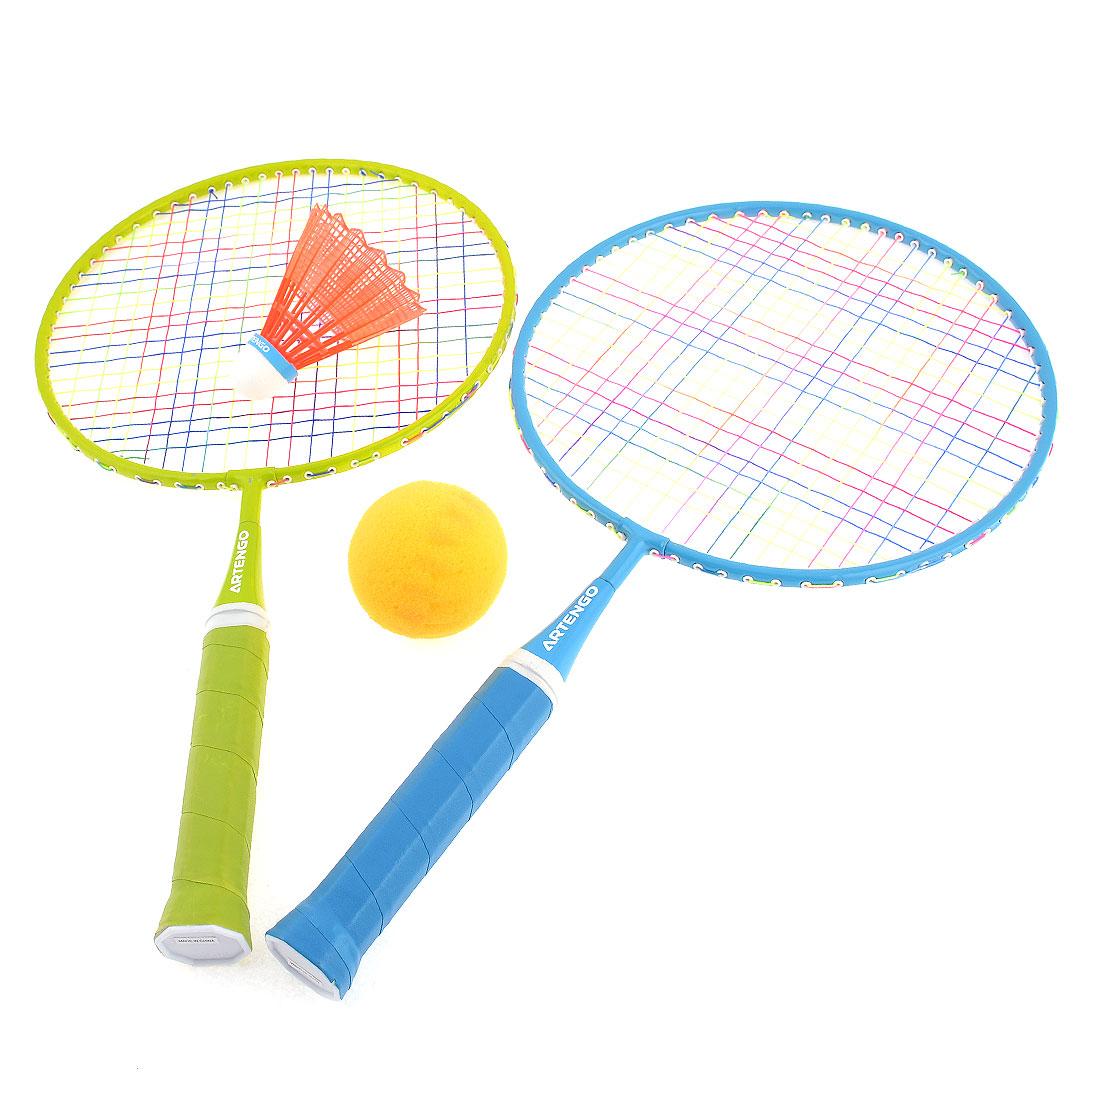 Pair Nonslip Handle Metal Frame Badminton Rackets w Shuttlecock